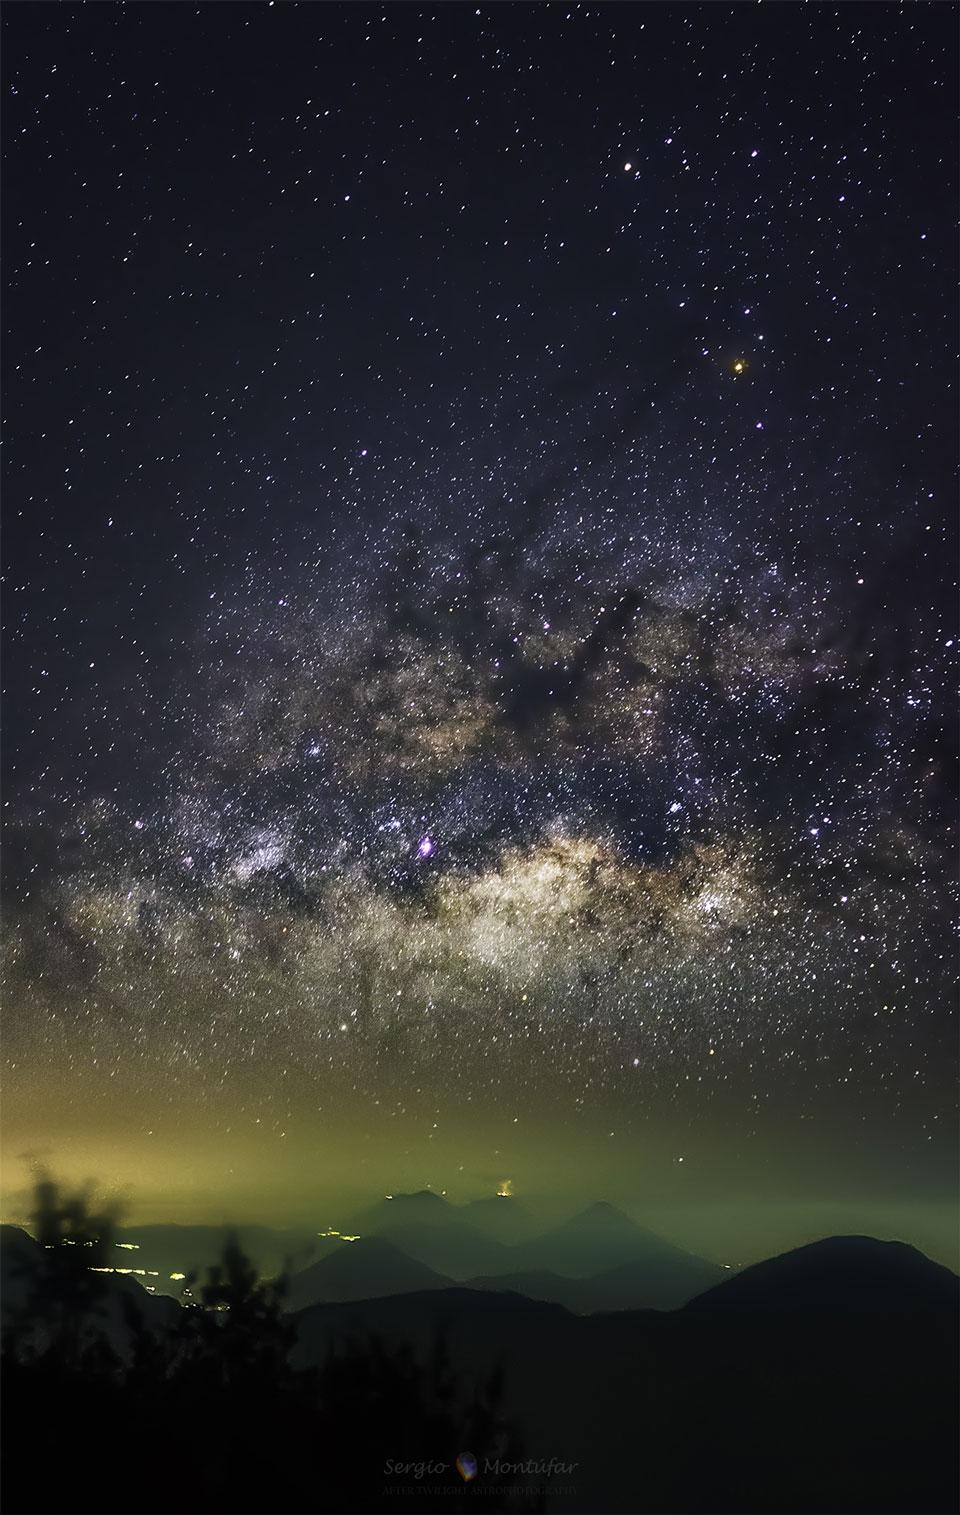 004 - APOD - APRIL 2015. VolcanoWay_montufar_960